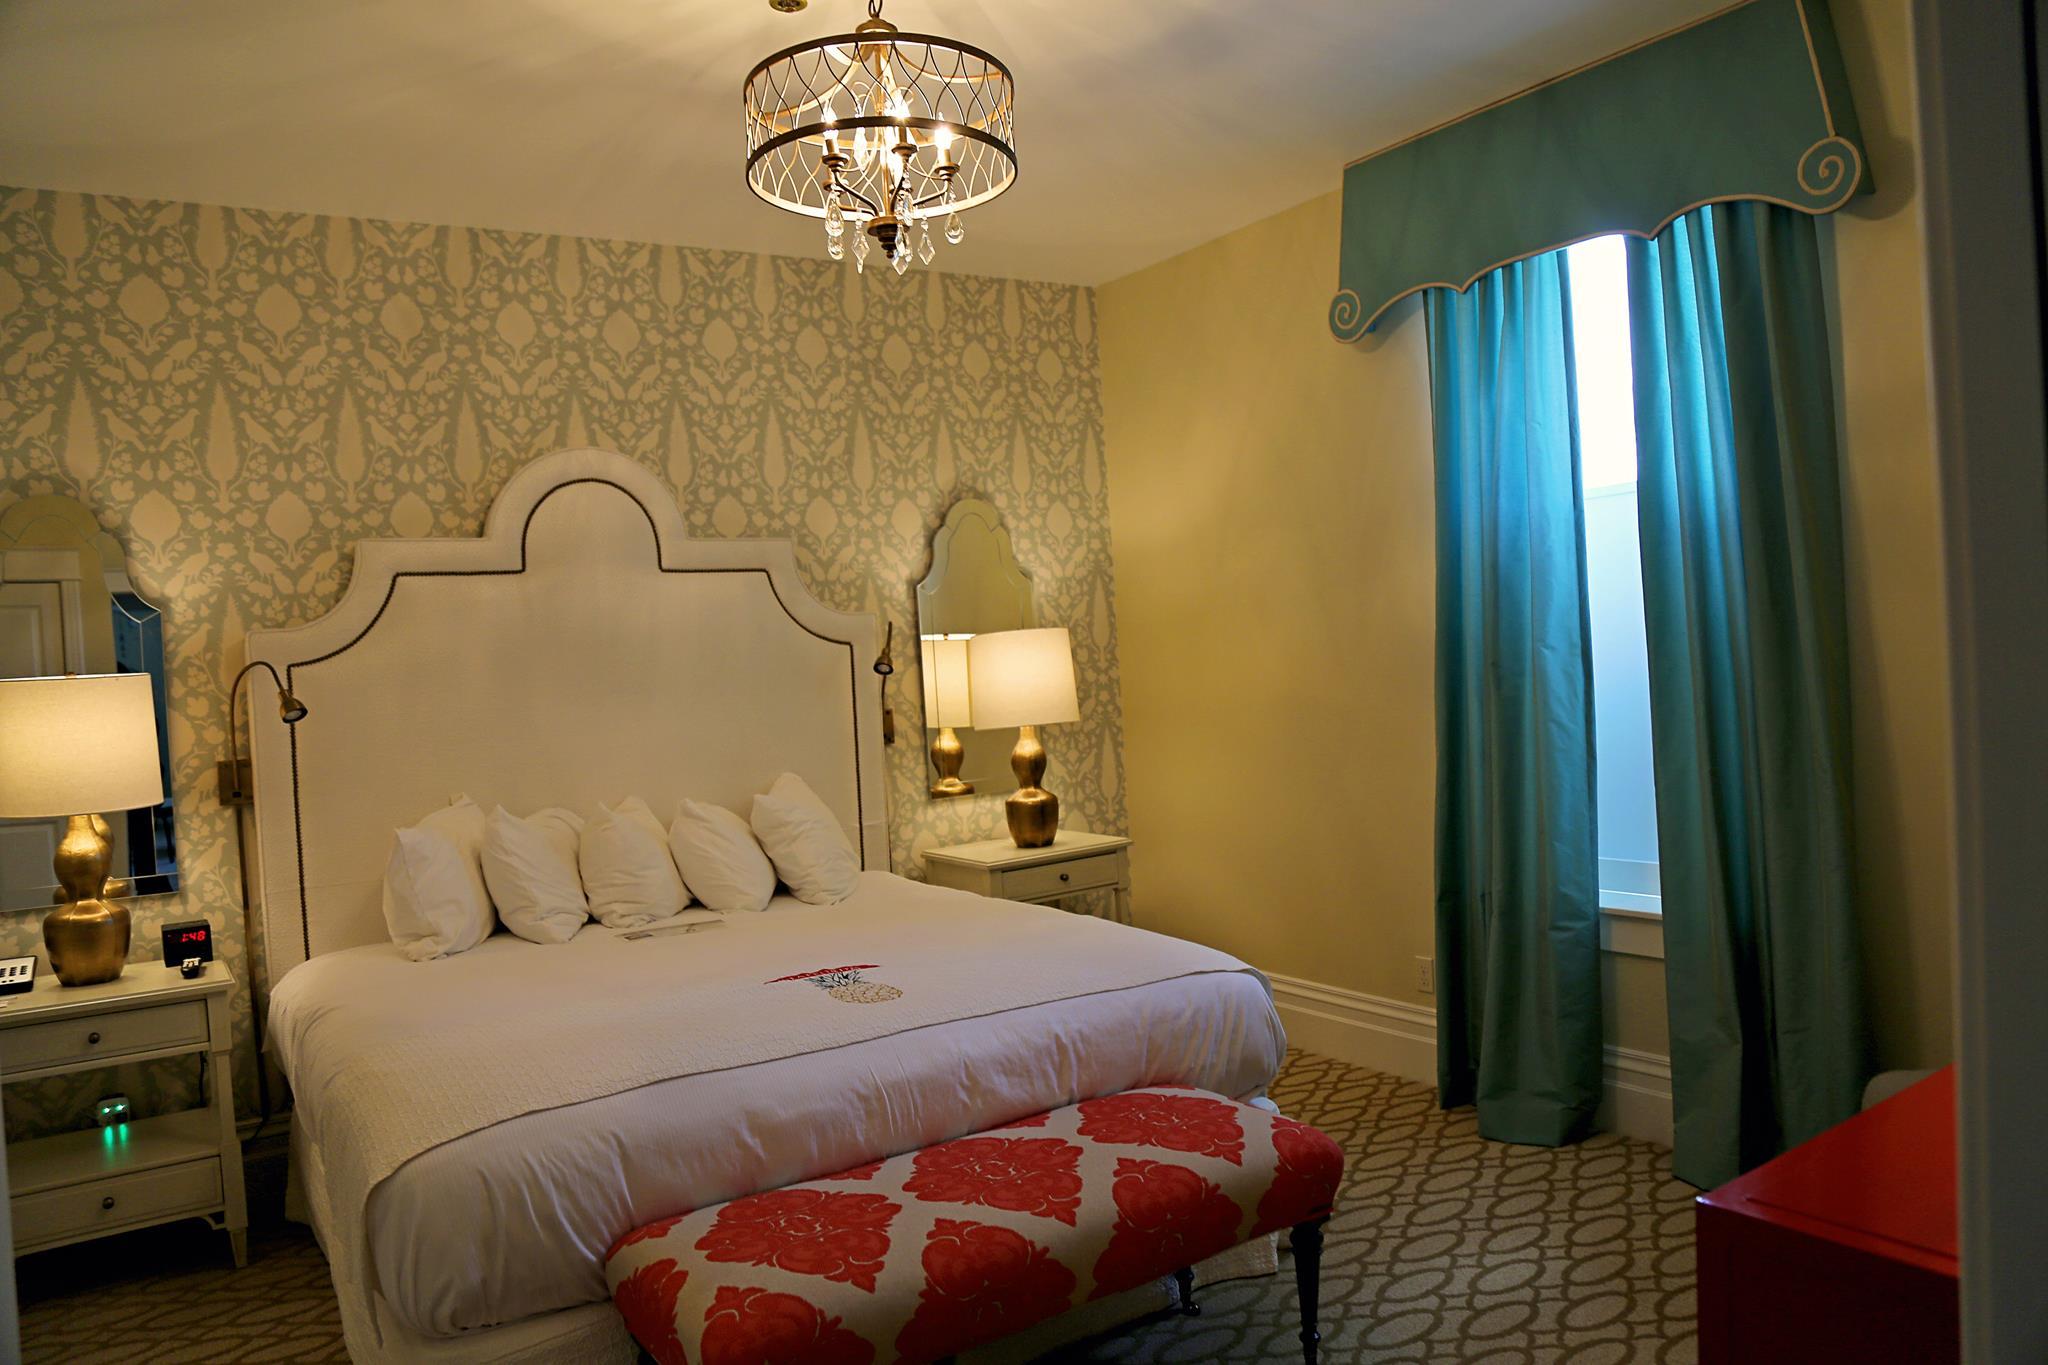 stafford's bed.jpg